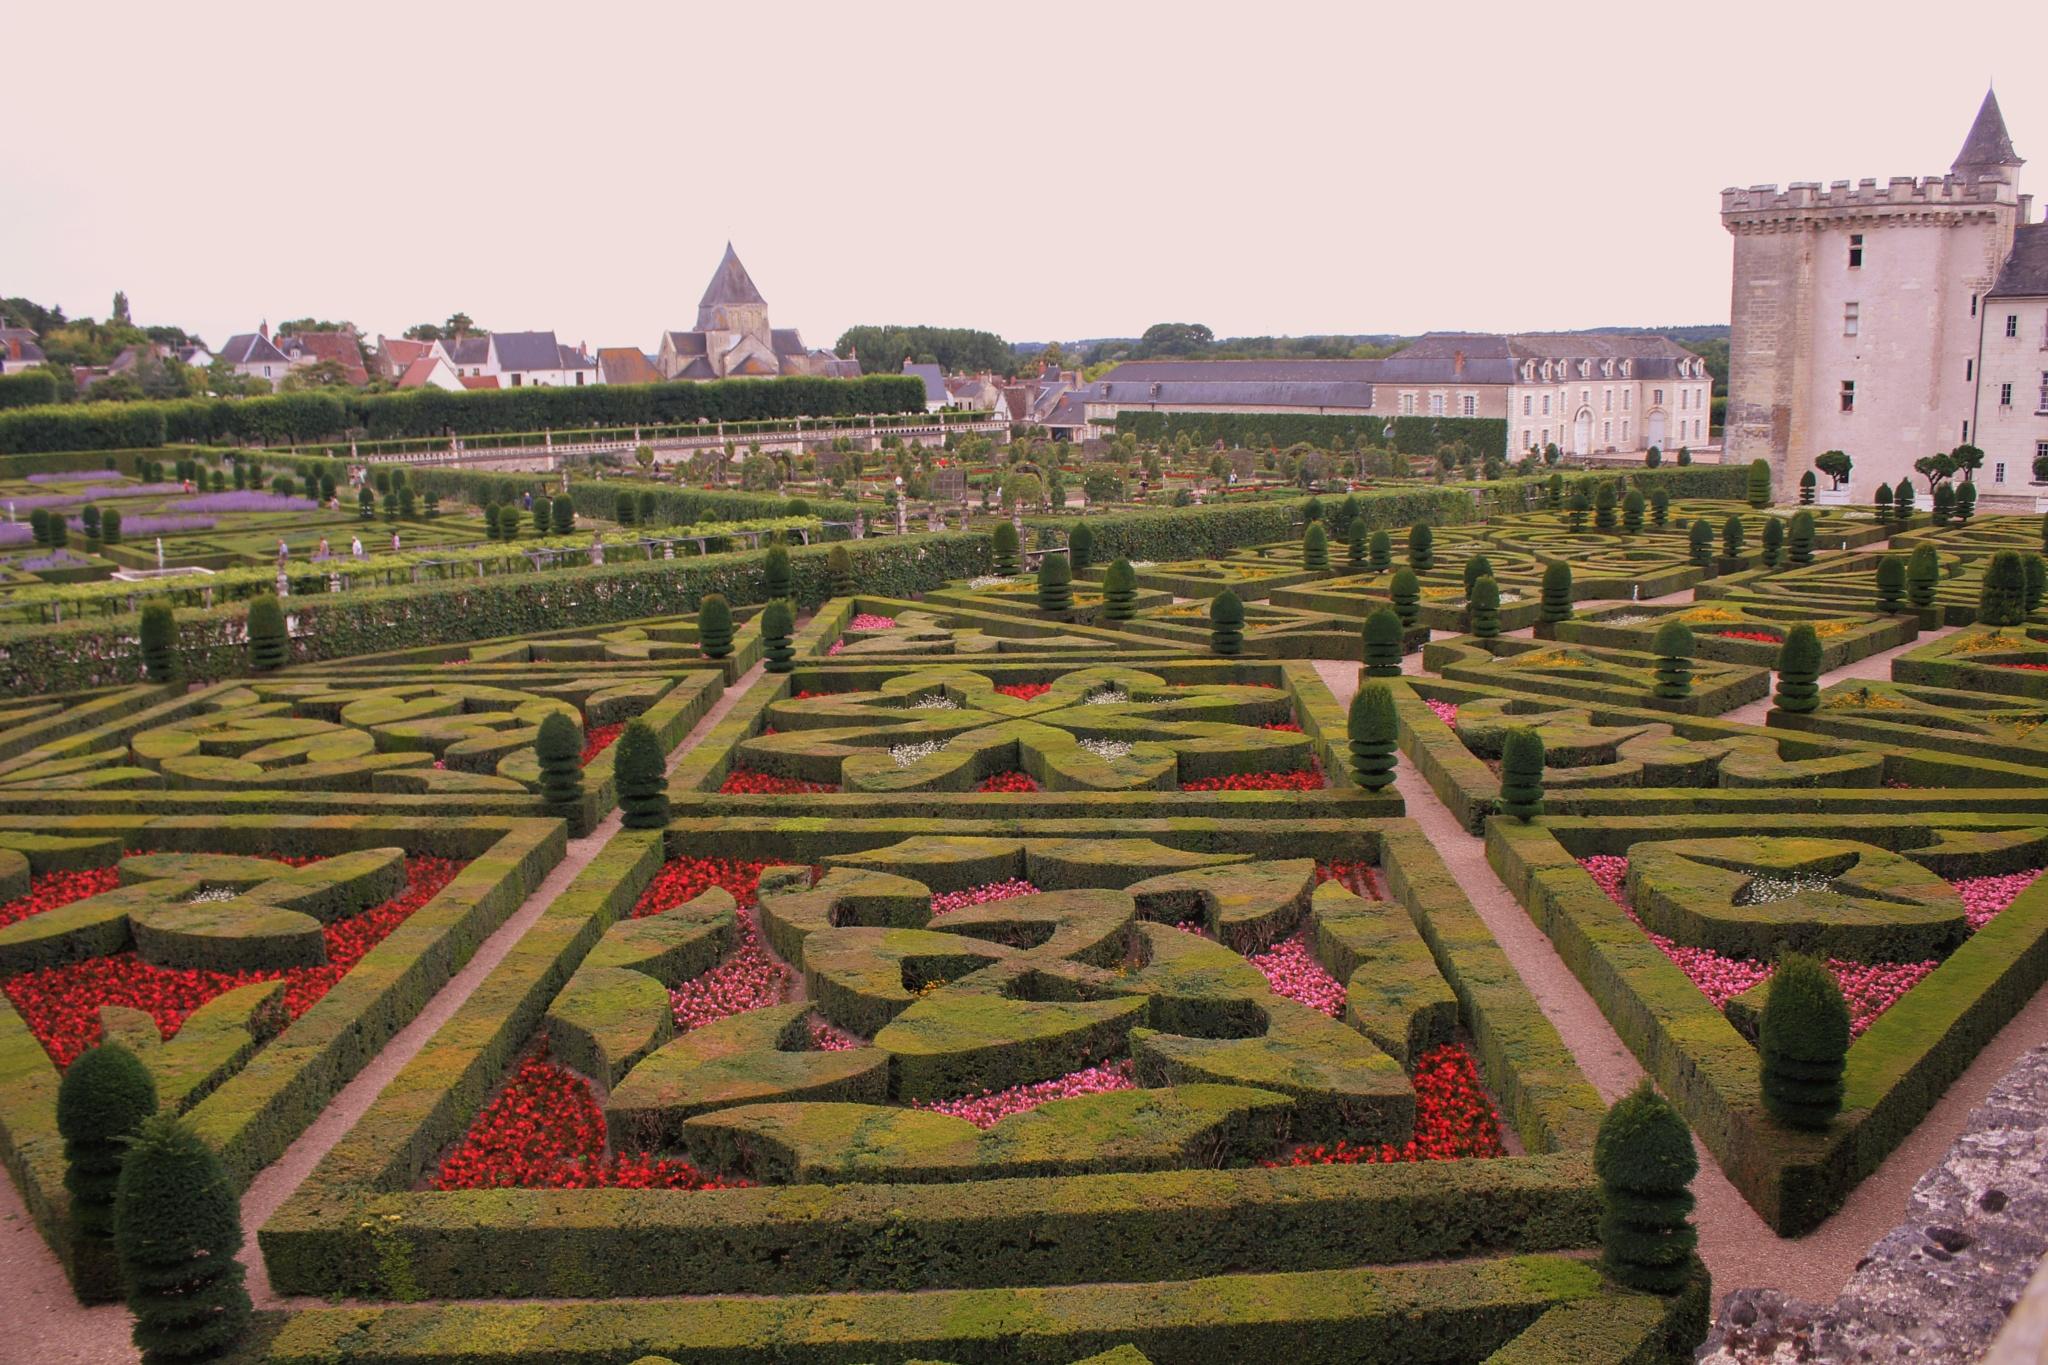 Vilandry Jardin by colin.savidge